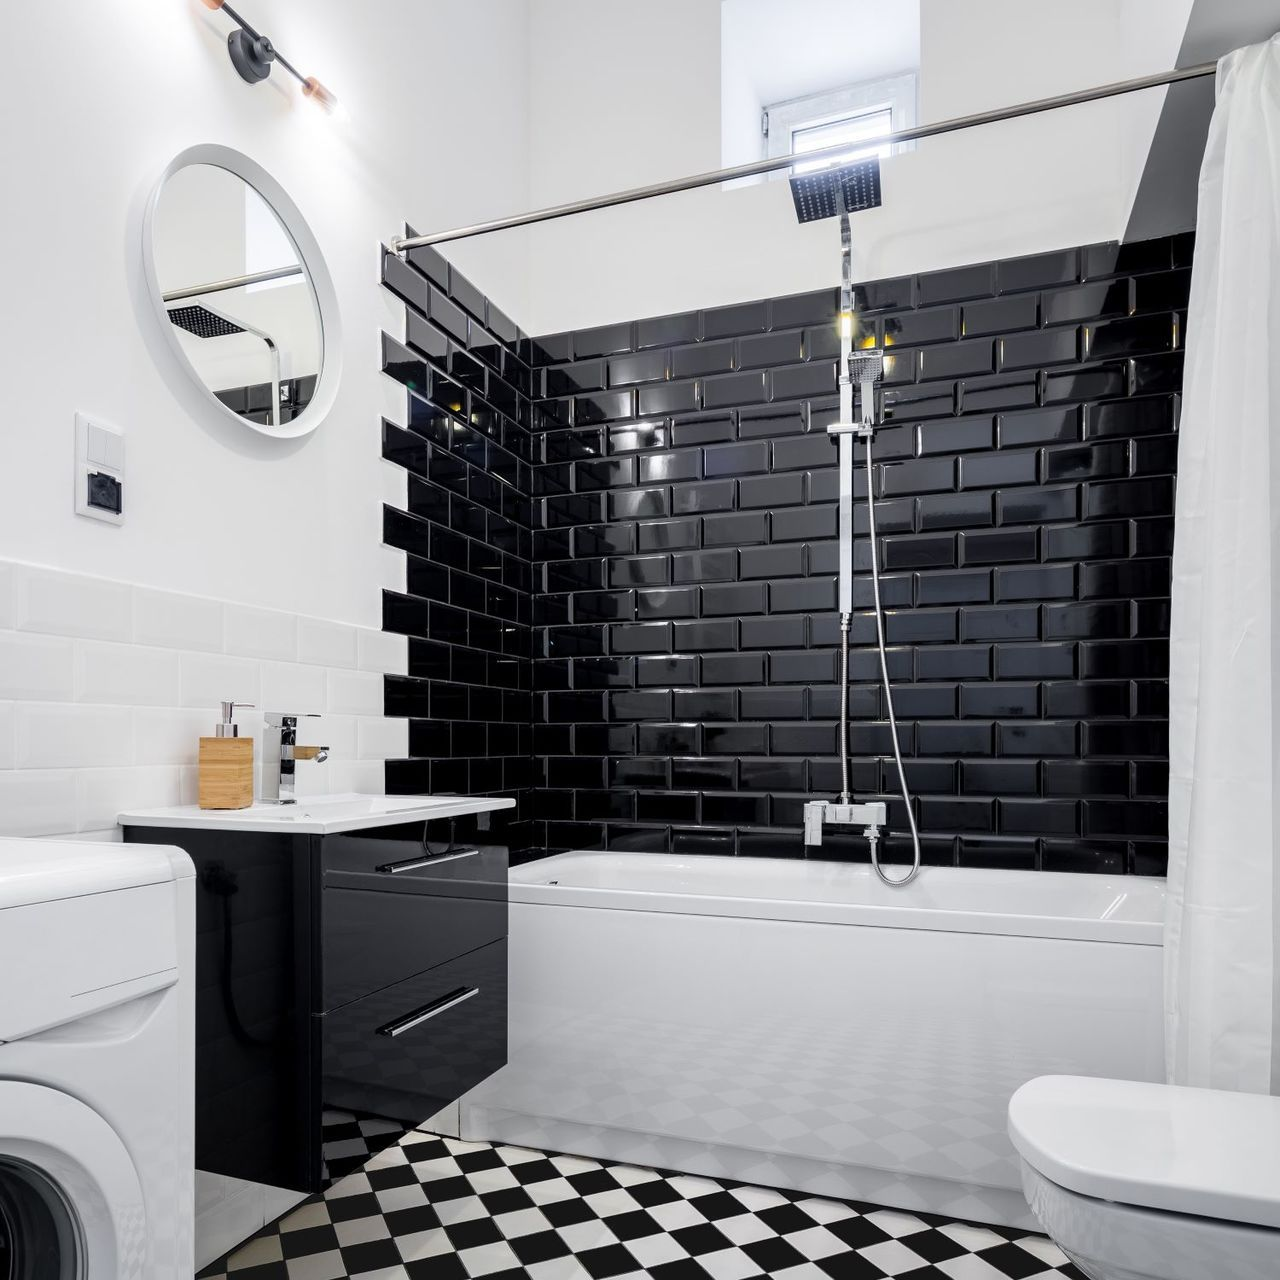 Beveled Subway Tile 3x6 Black 3 49 Sq Ft Black Tile Bathrooms Beveled Subway Tile Bathroom Design